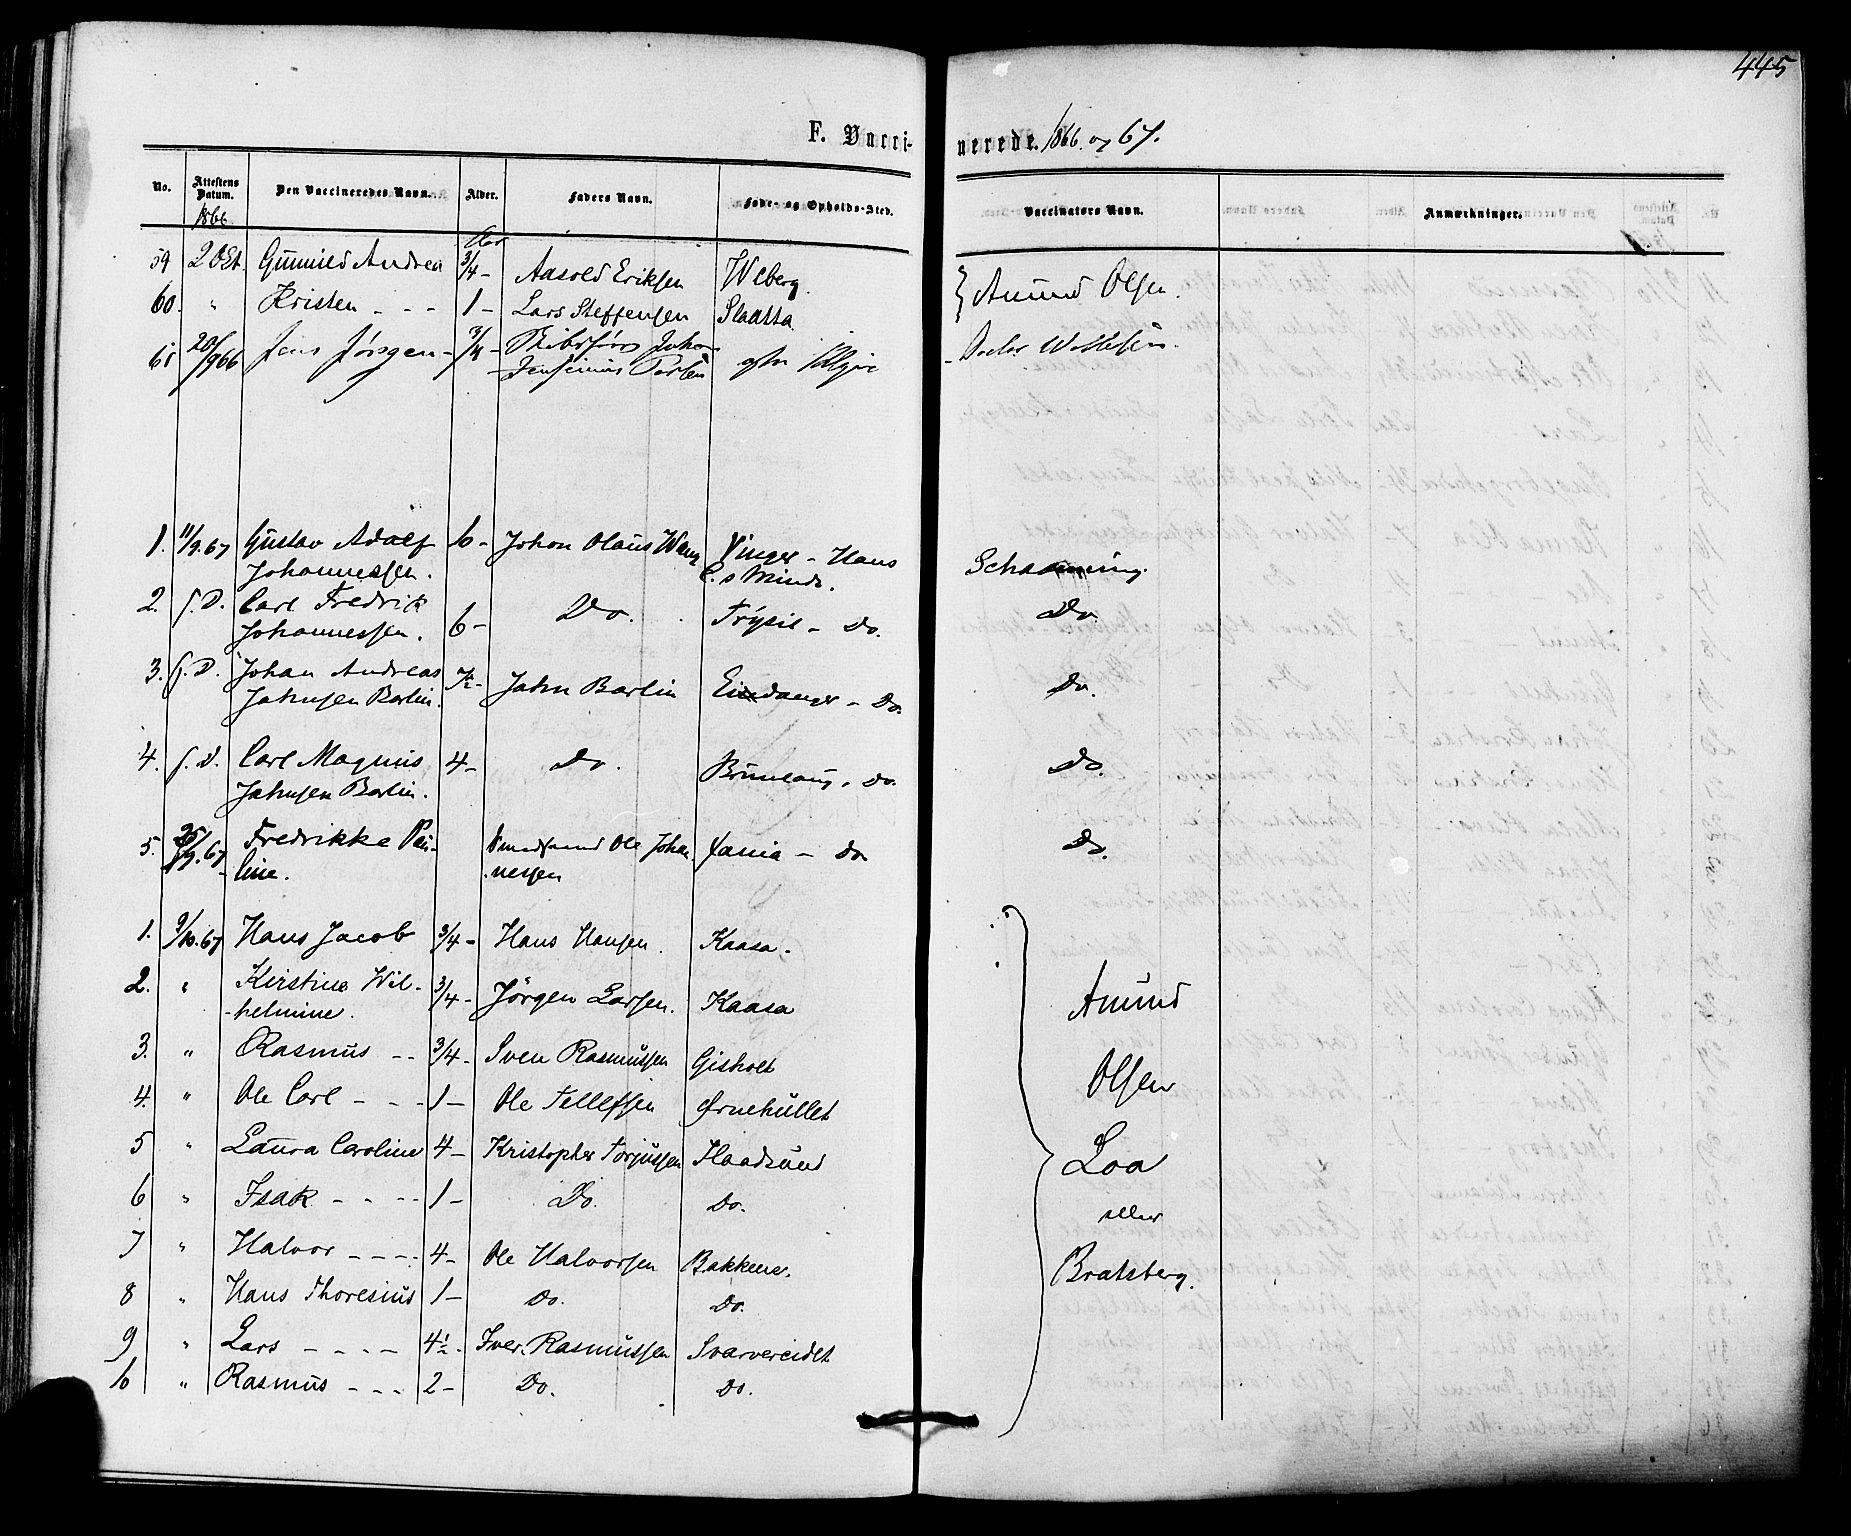 SAKO, Solum kirkebøker, F/Fa/L0008: Ministerialbok nr. I 8, 1865-1876, s. 445